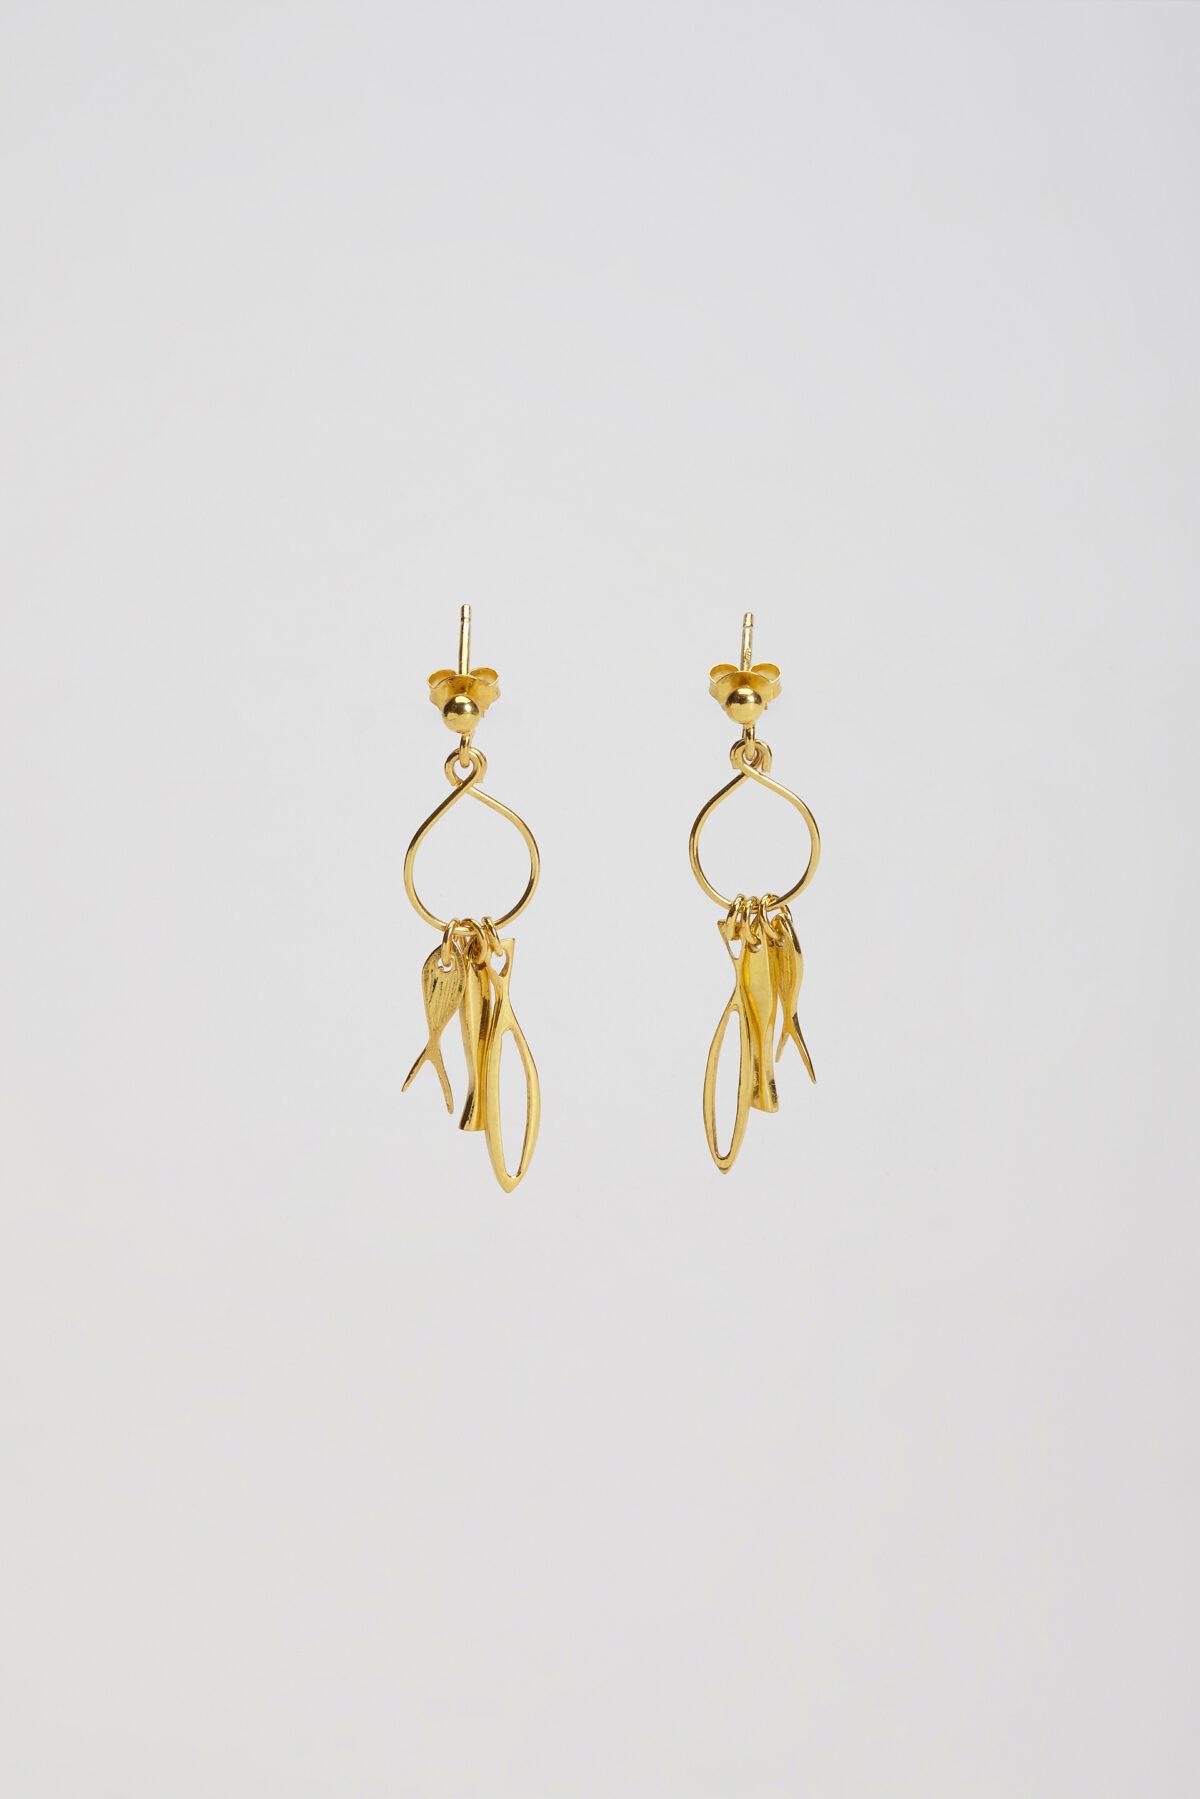 wazis-gr-earrings-gold-plated-kimale-matchboxathens